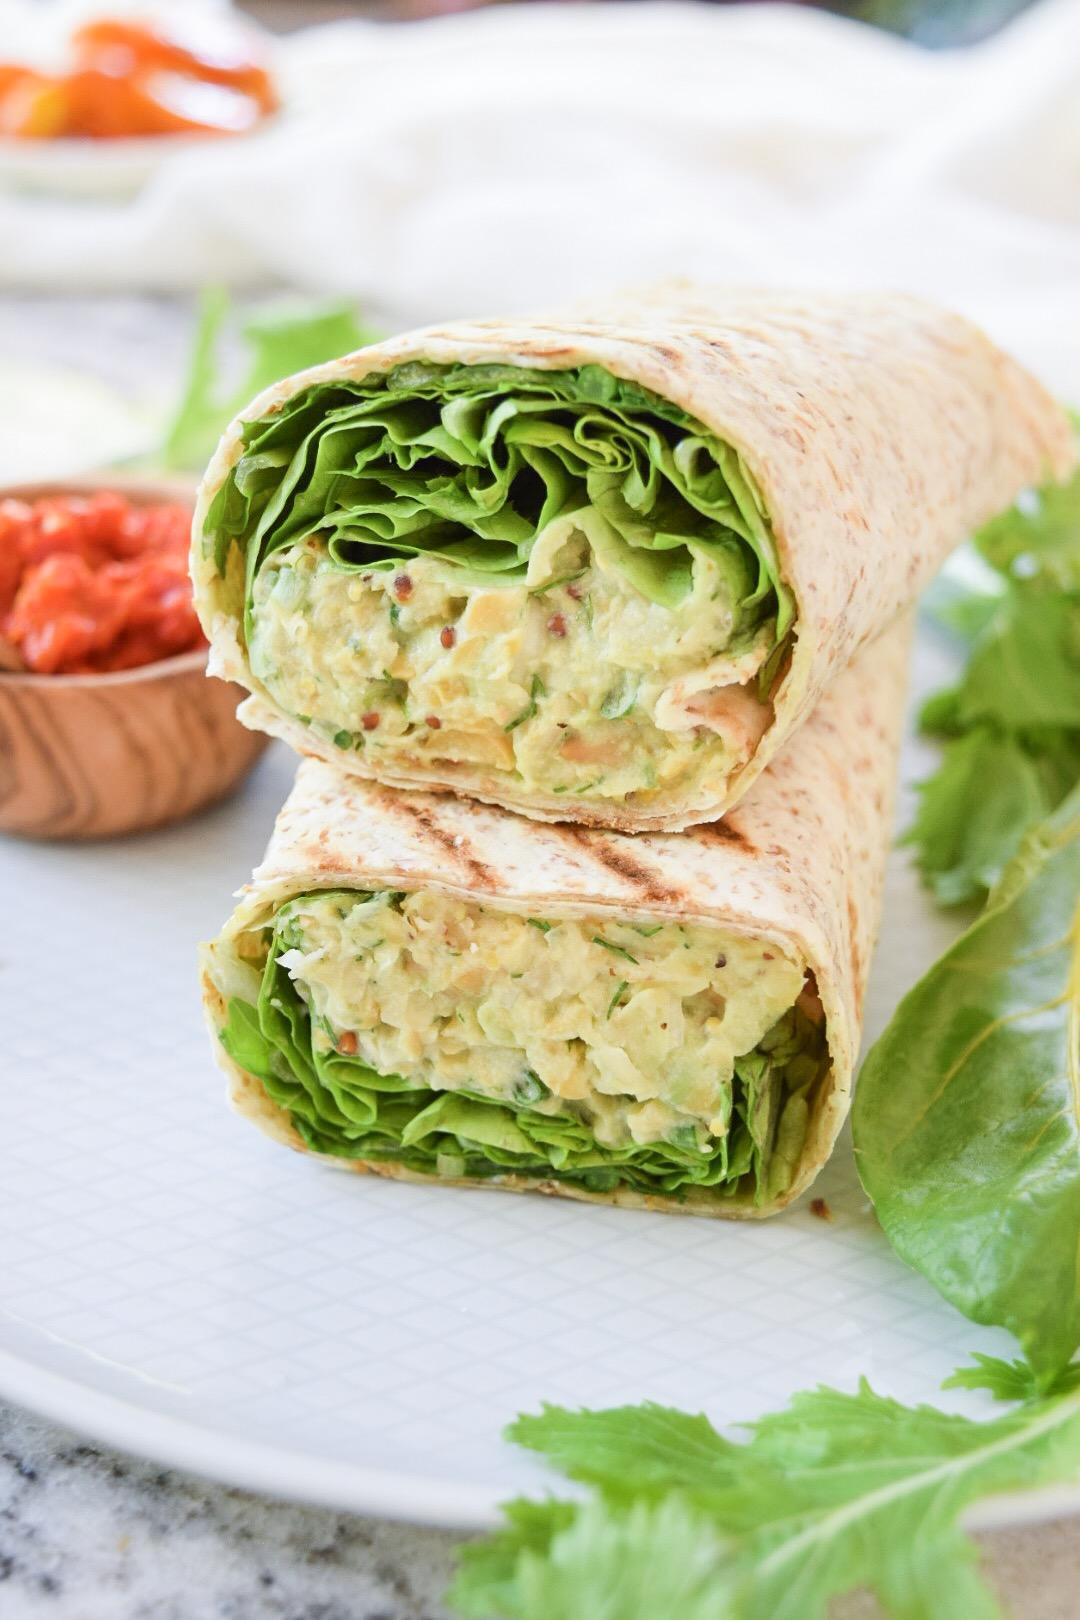 Dinner 4 - Chickpea Avocado Wrap